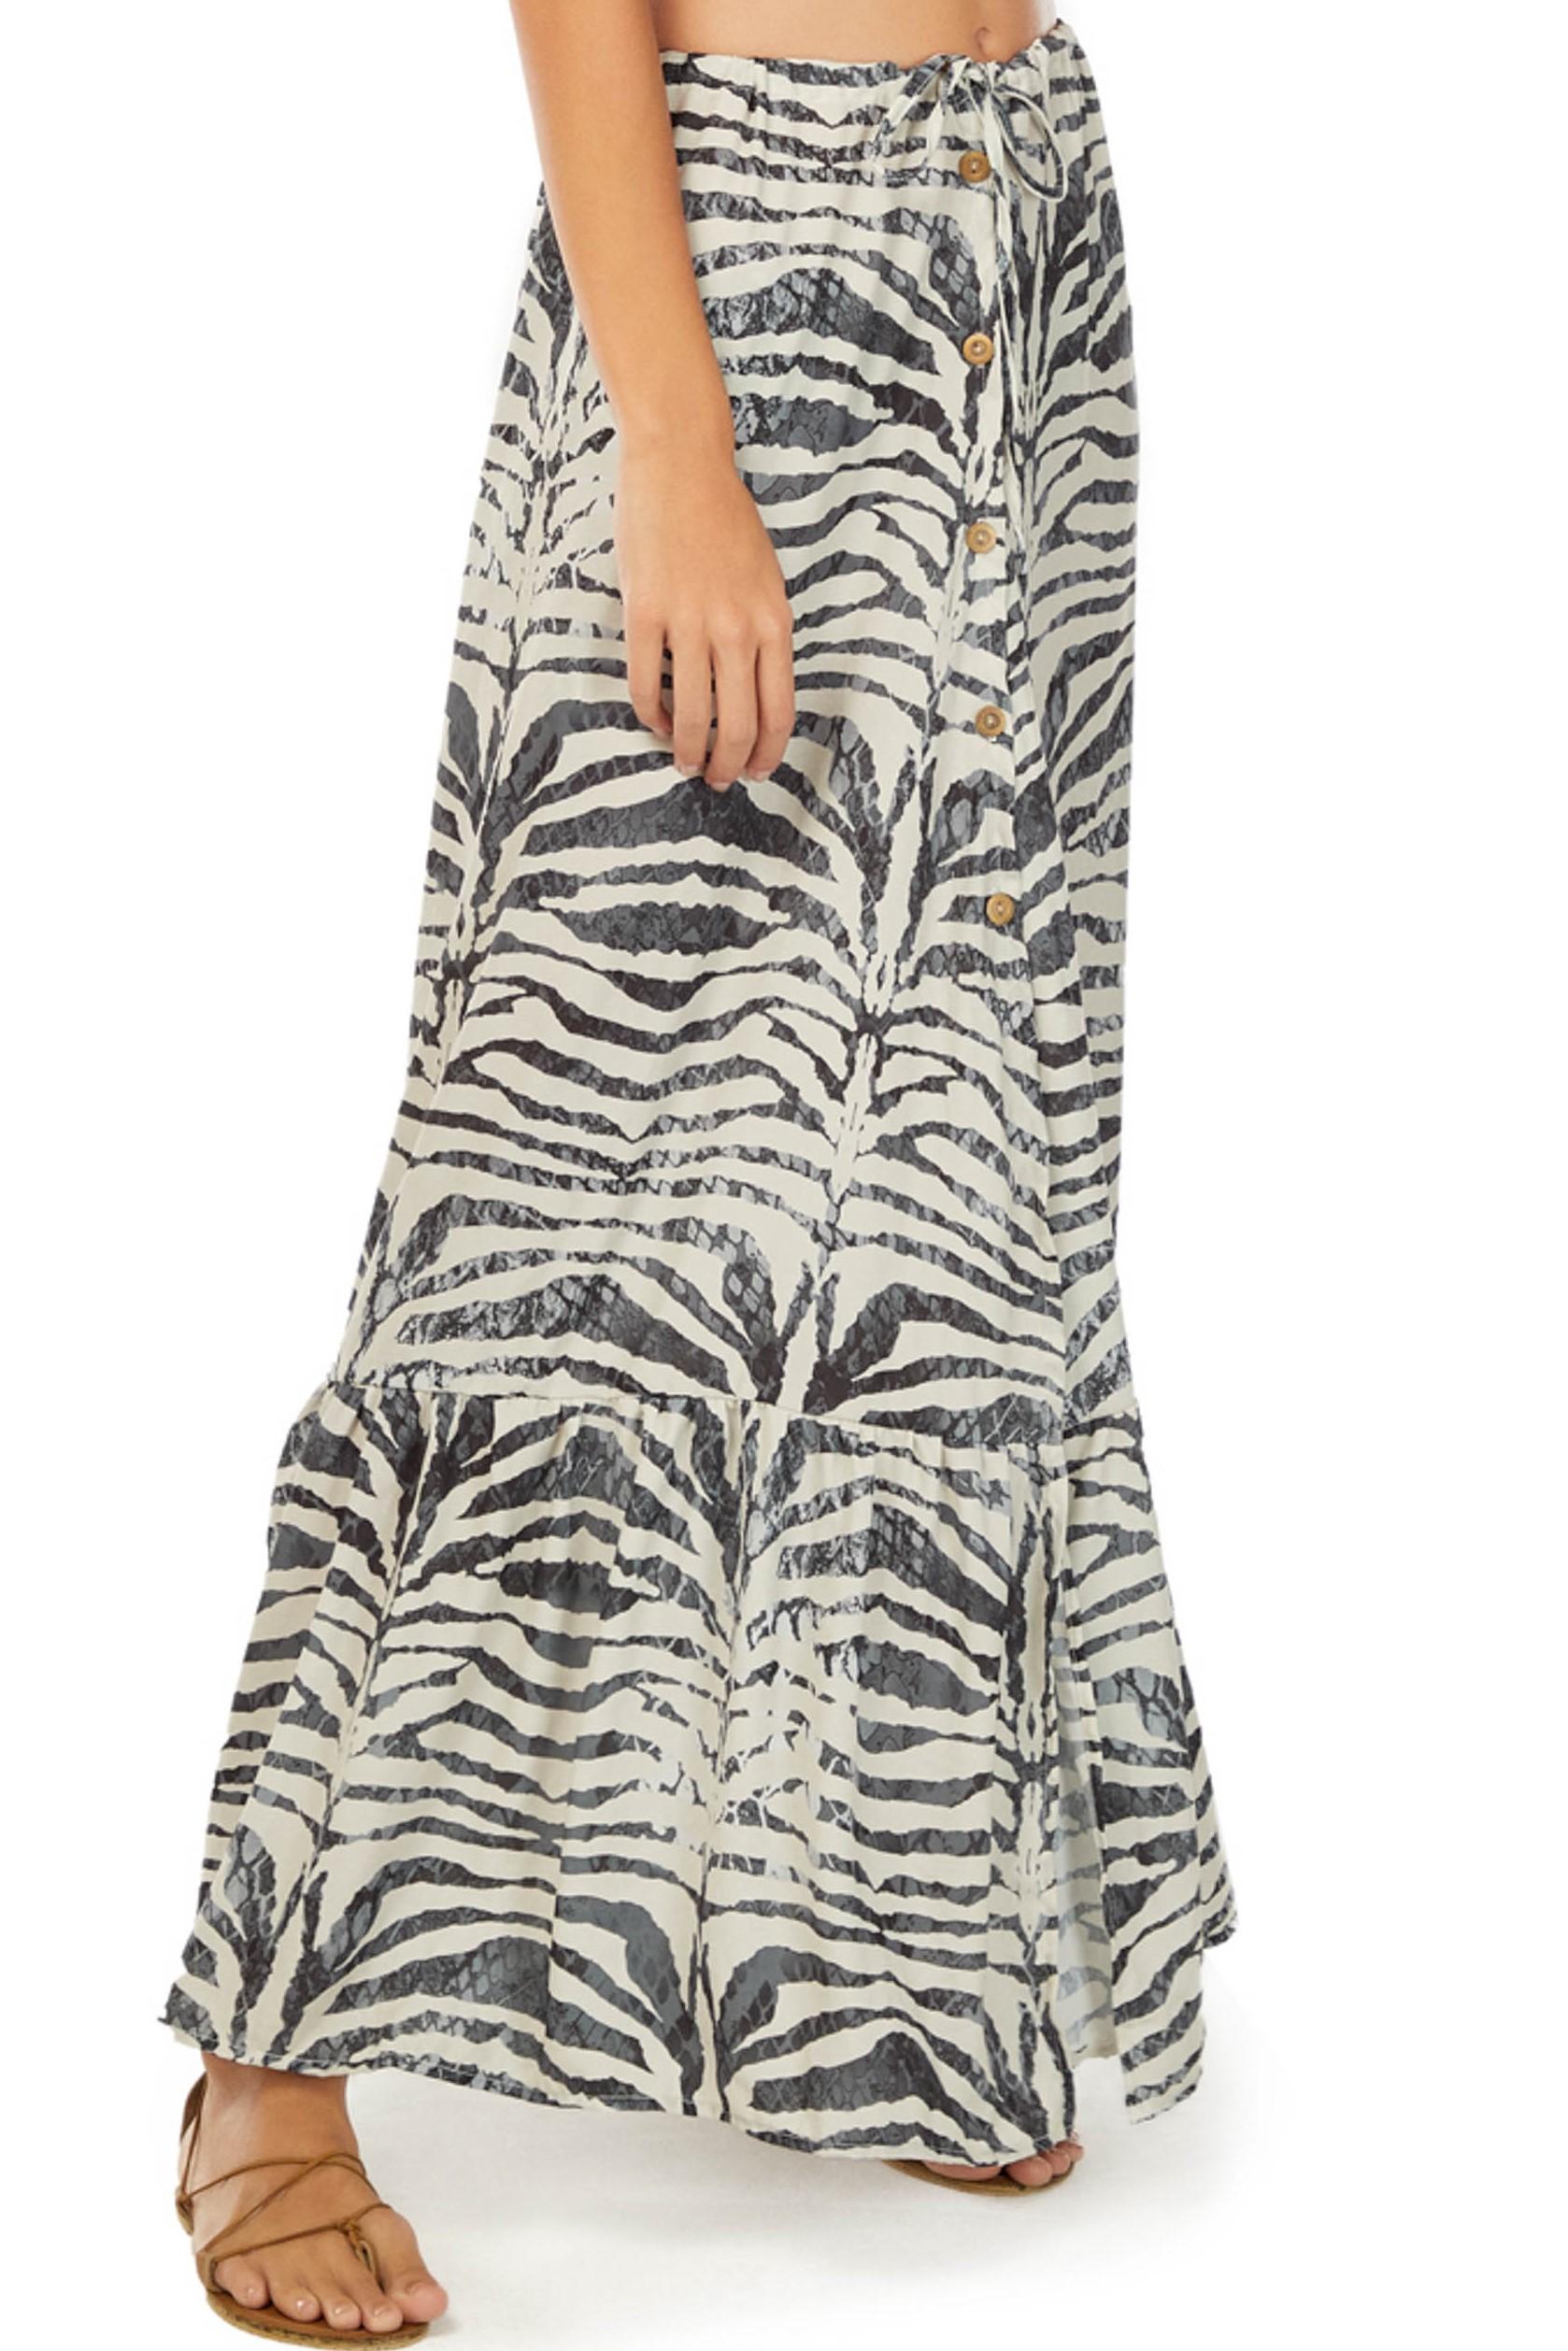 Cosita Linda Zebra Skirt